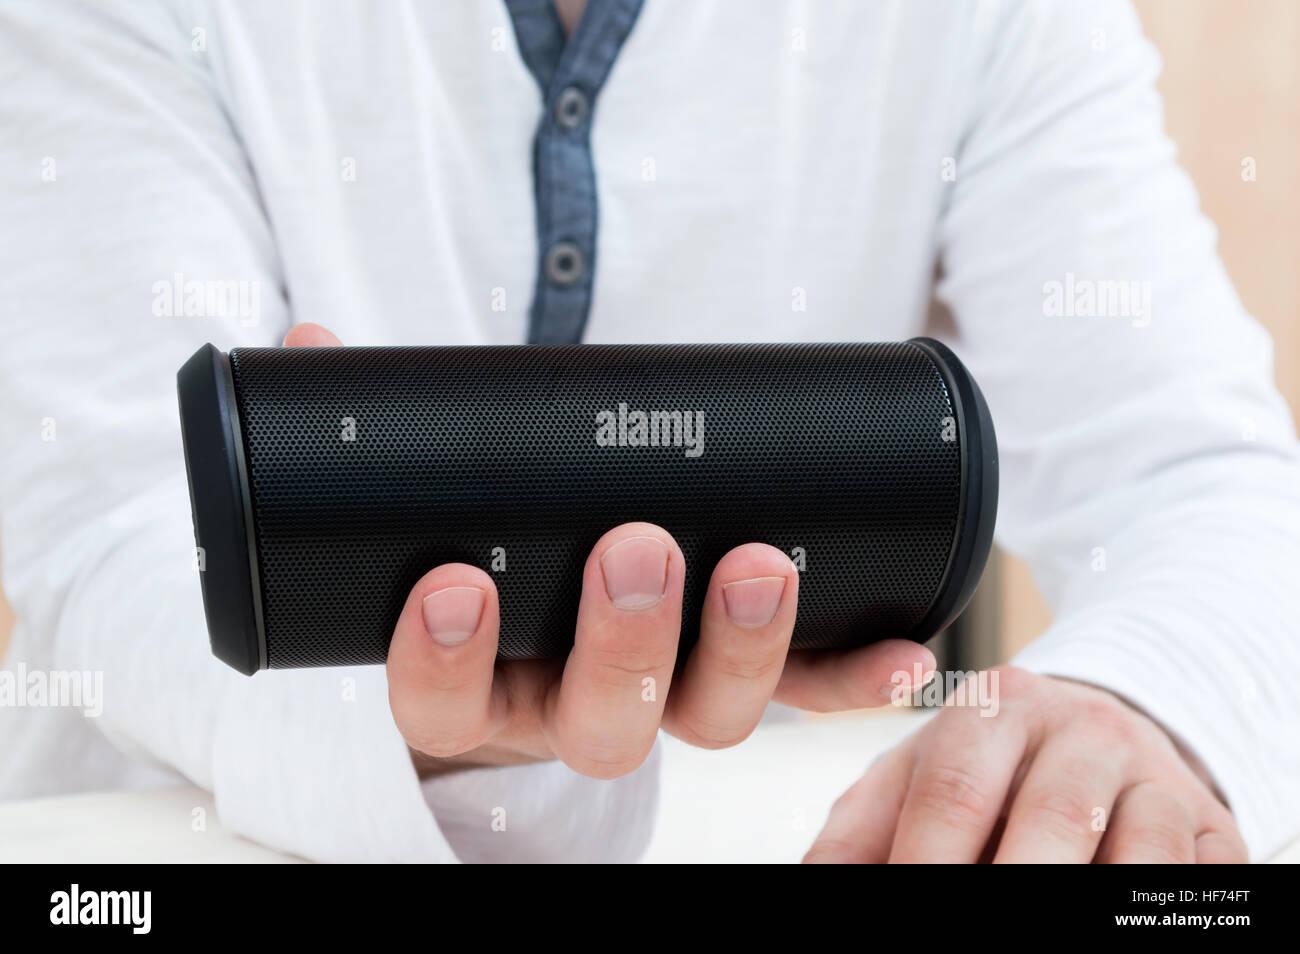 Man shows Modern wireless audio device. - Stock Image